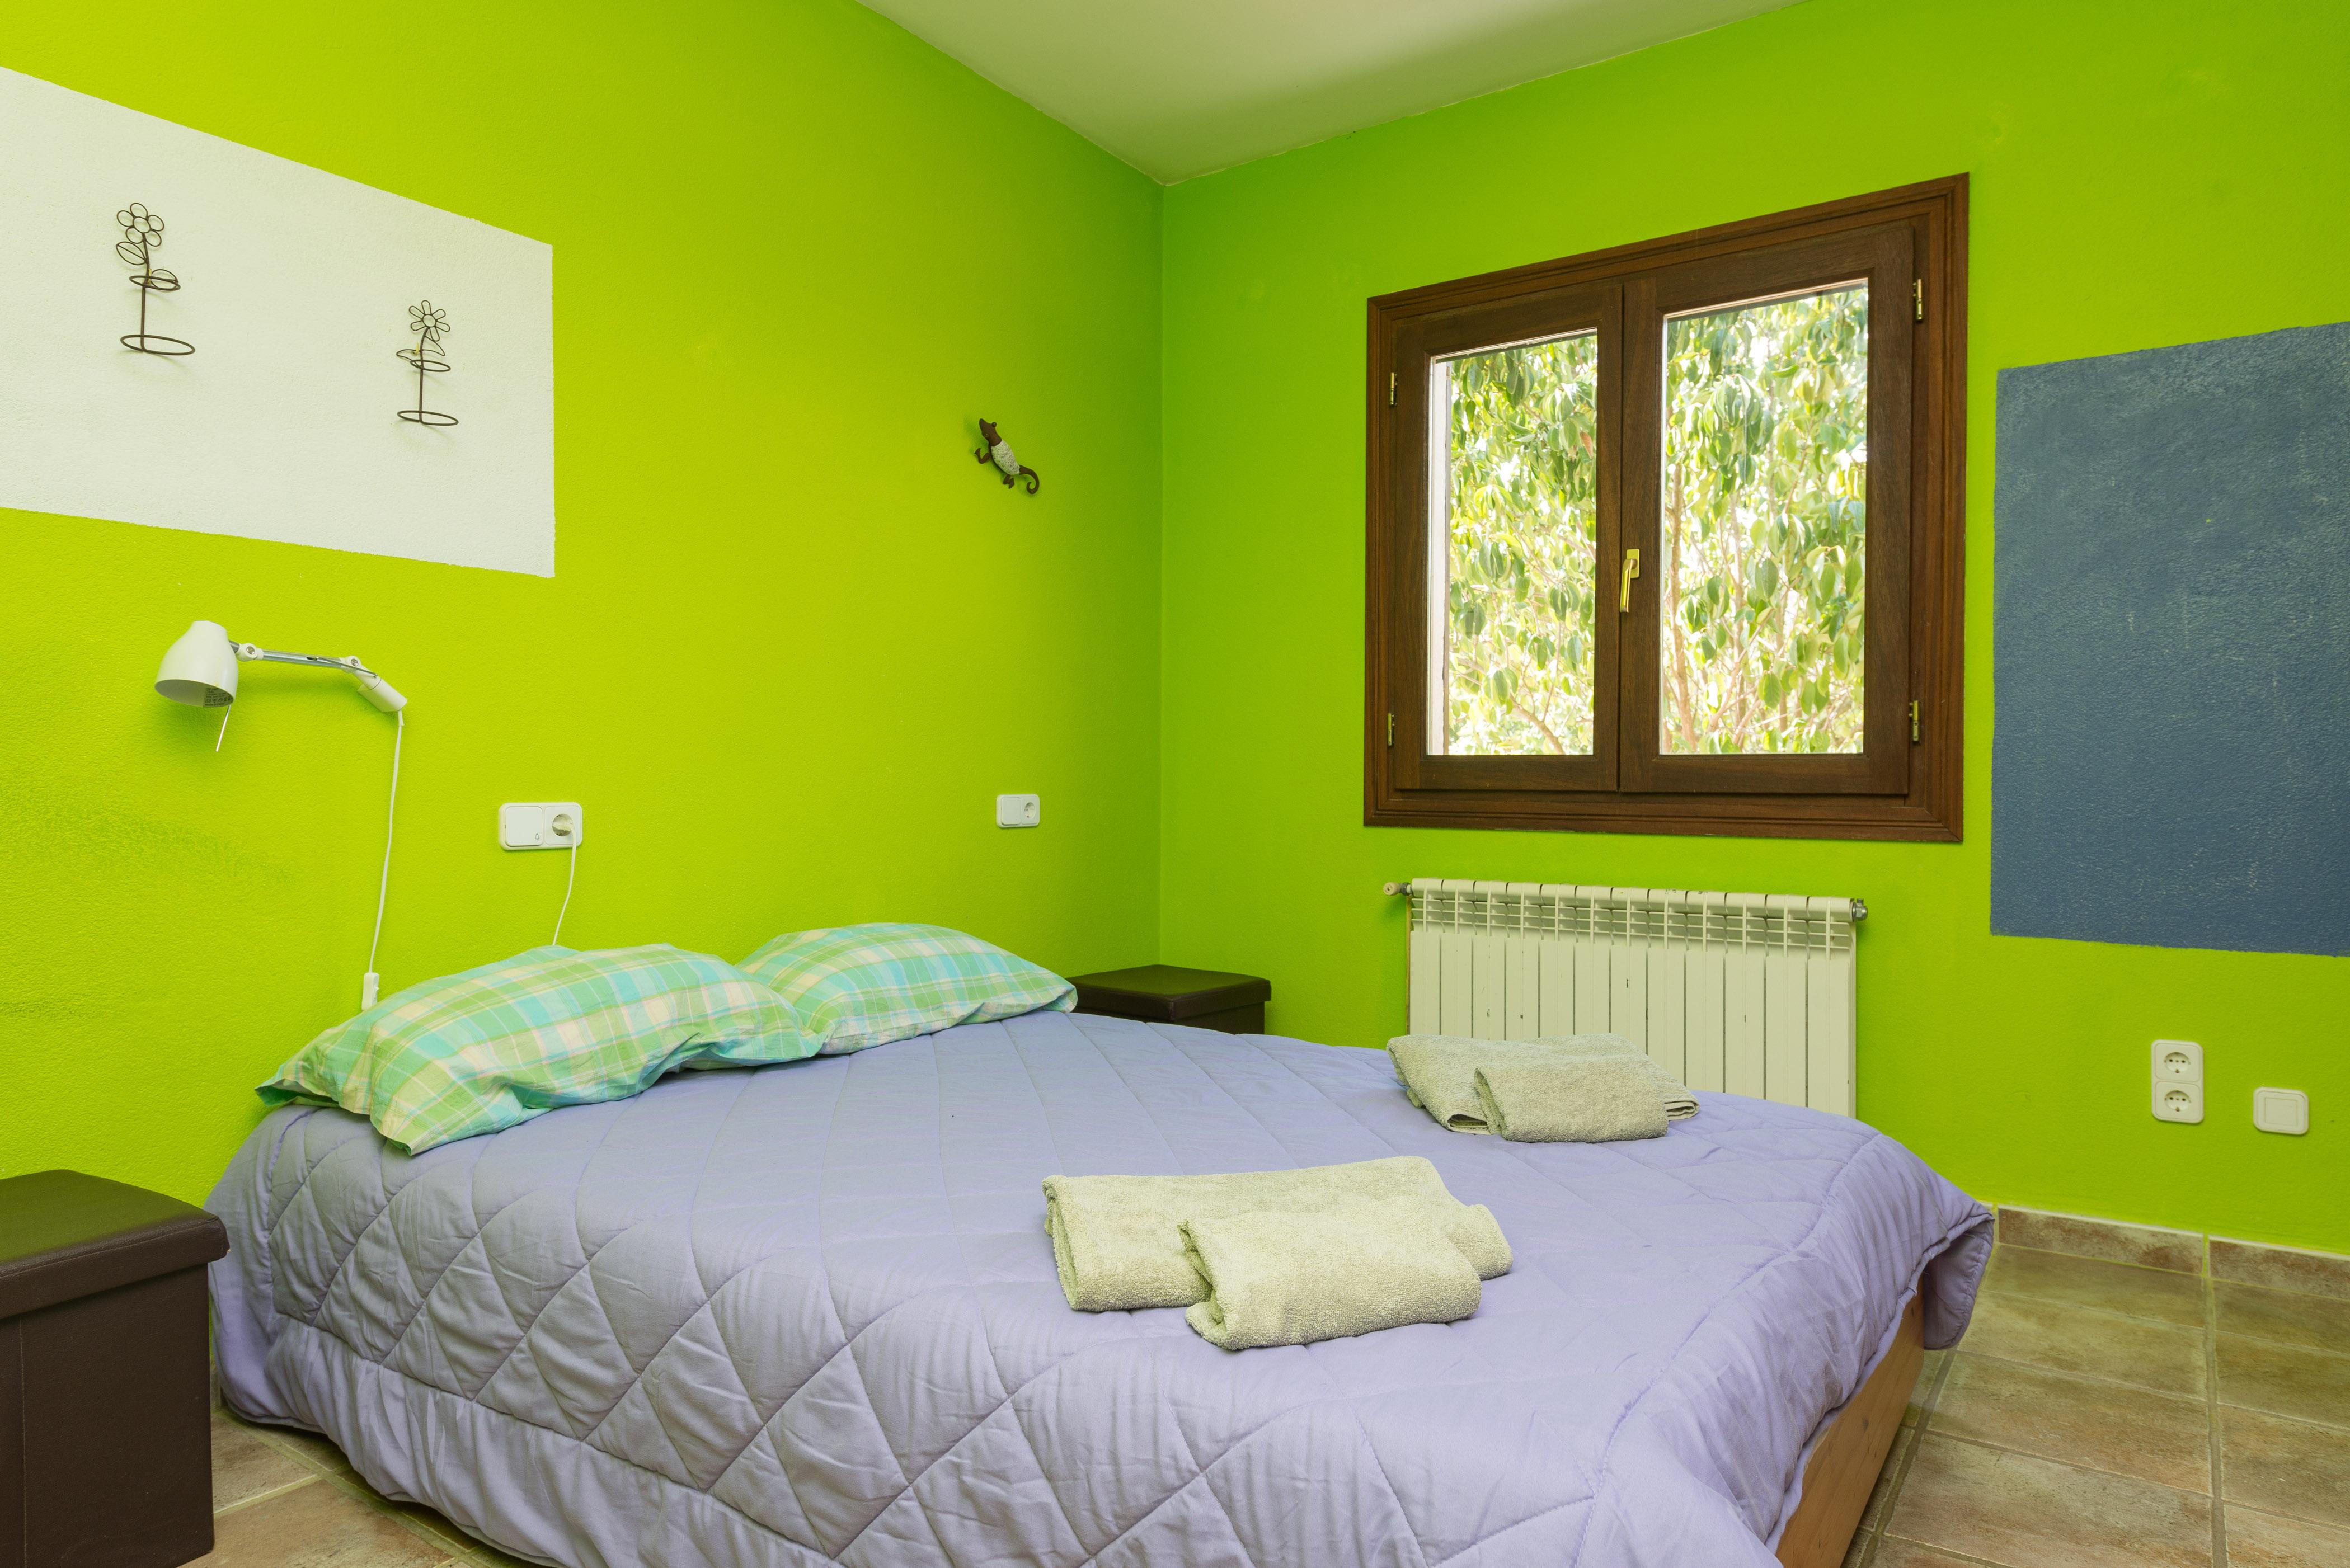 Ferienhaus SA CORBAIA (2020559), Arta, Mallorca, Balearische Inseln, Spanien, Bild 26